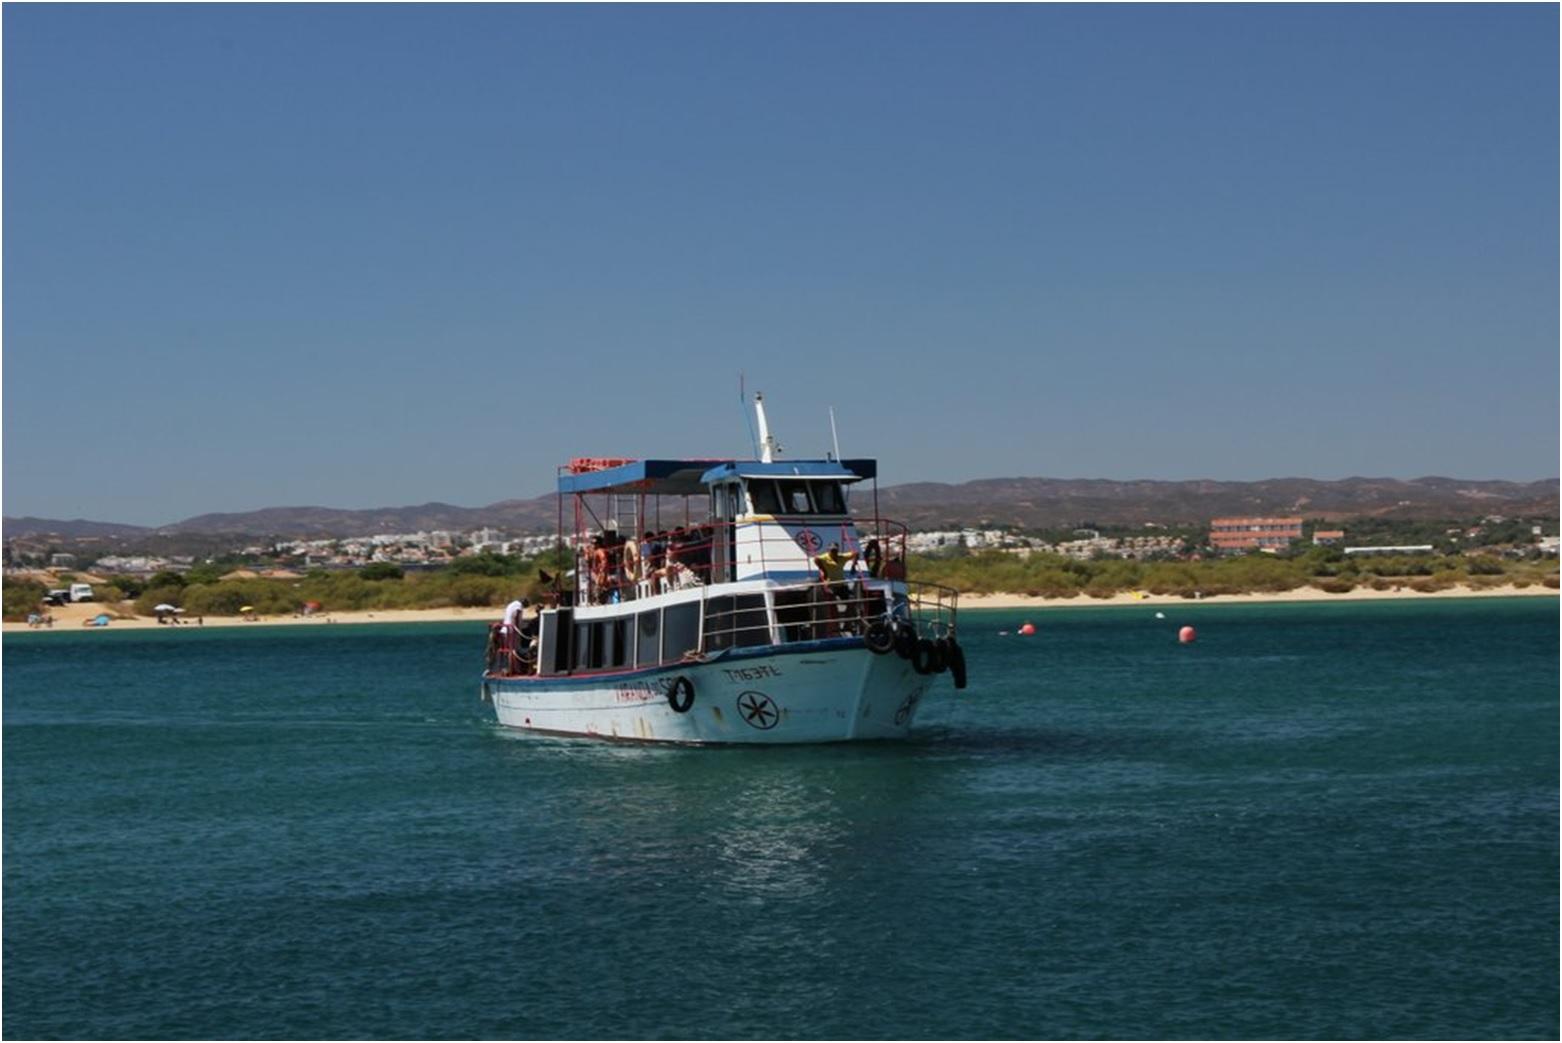 ilha_tavira-ferry_boat